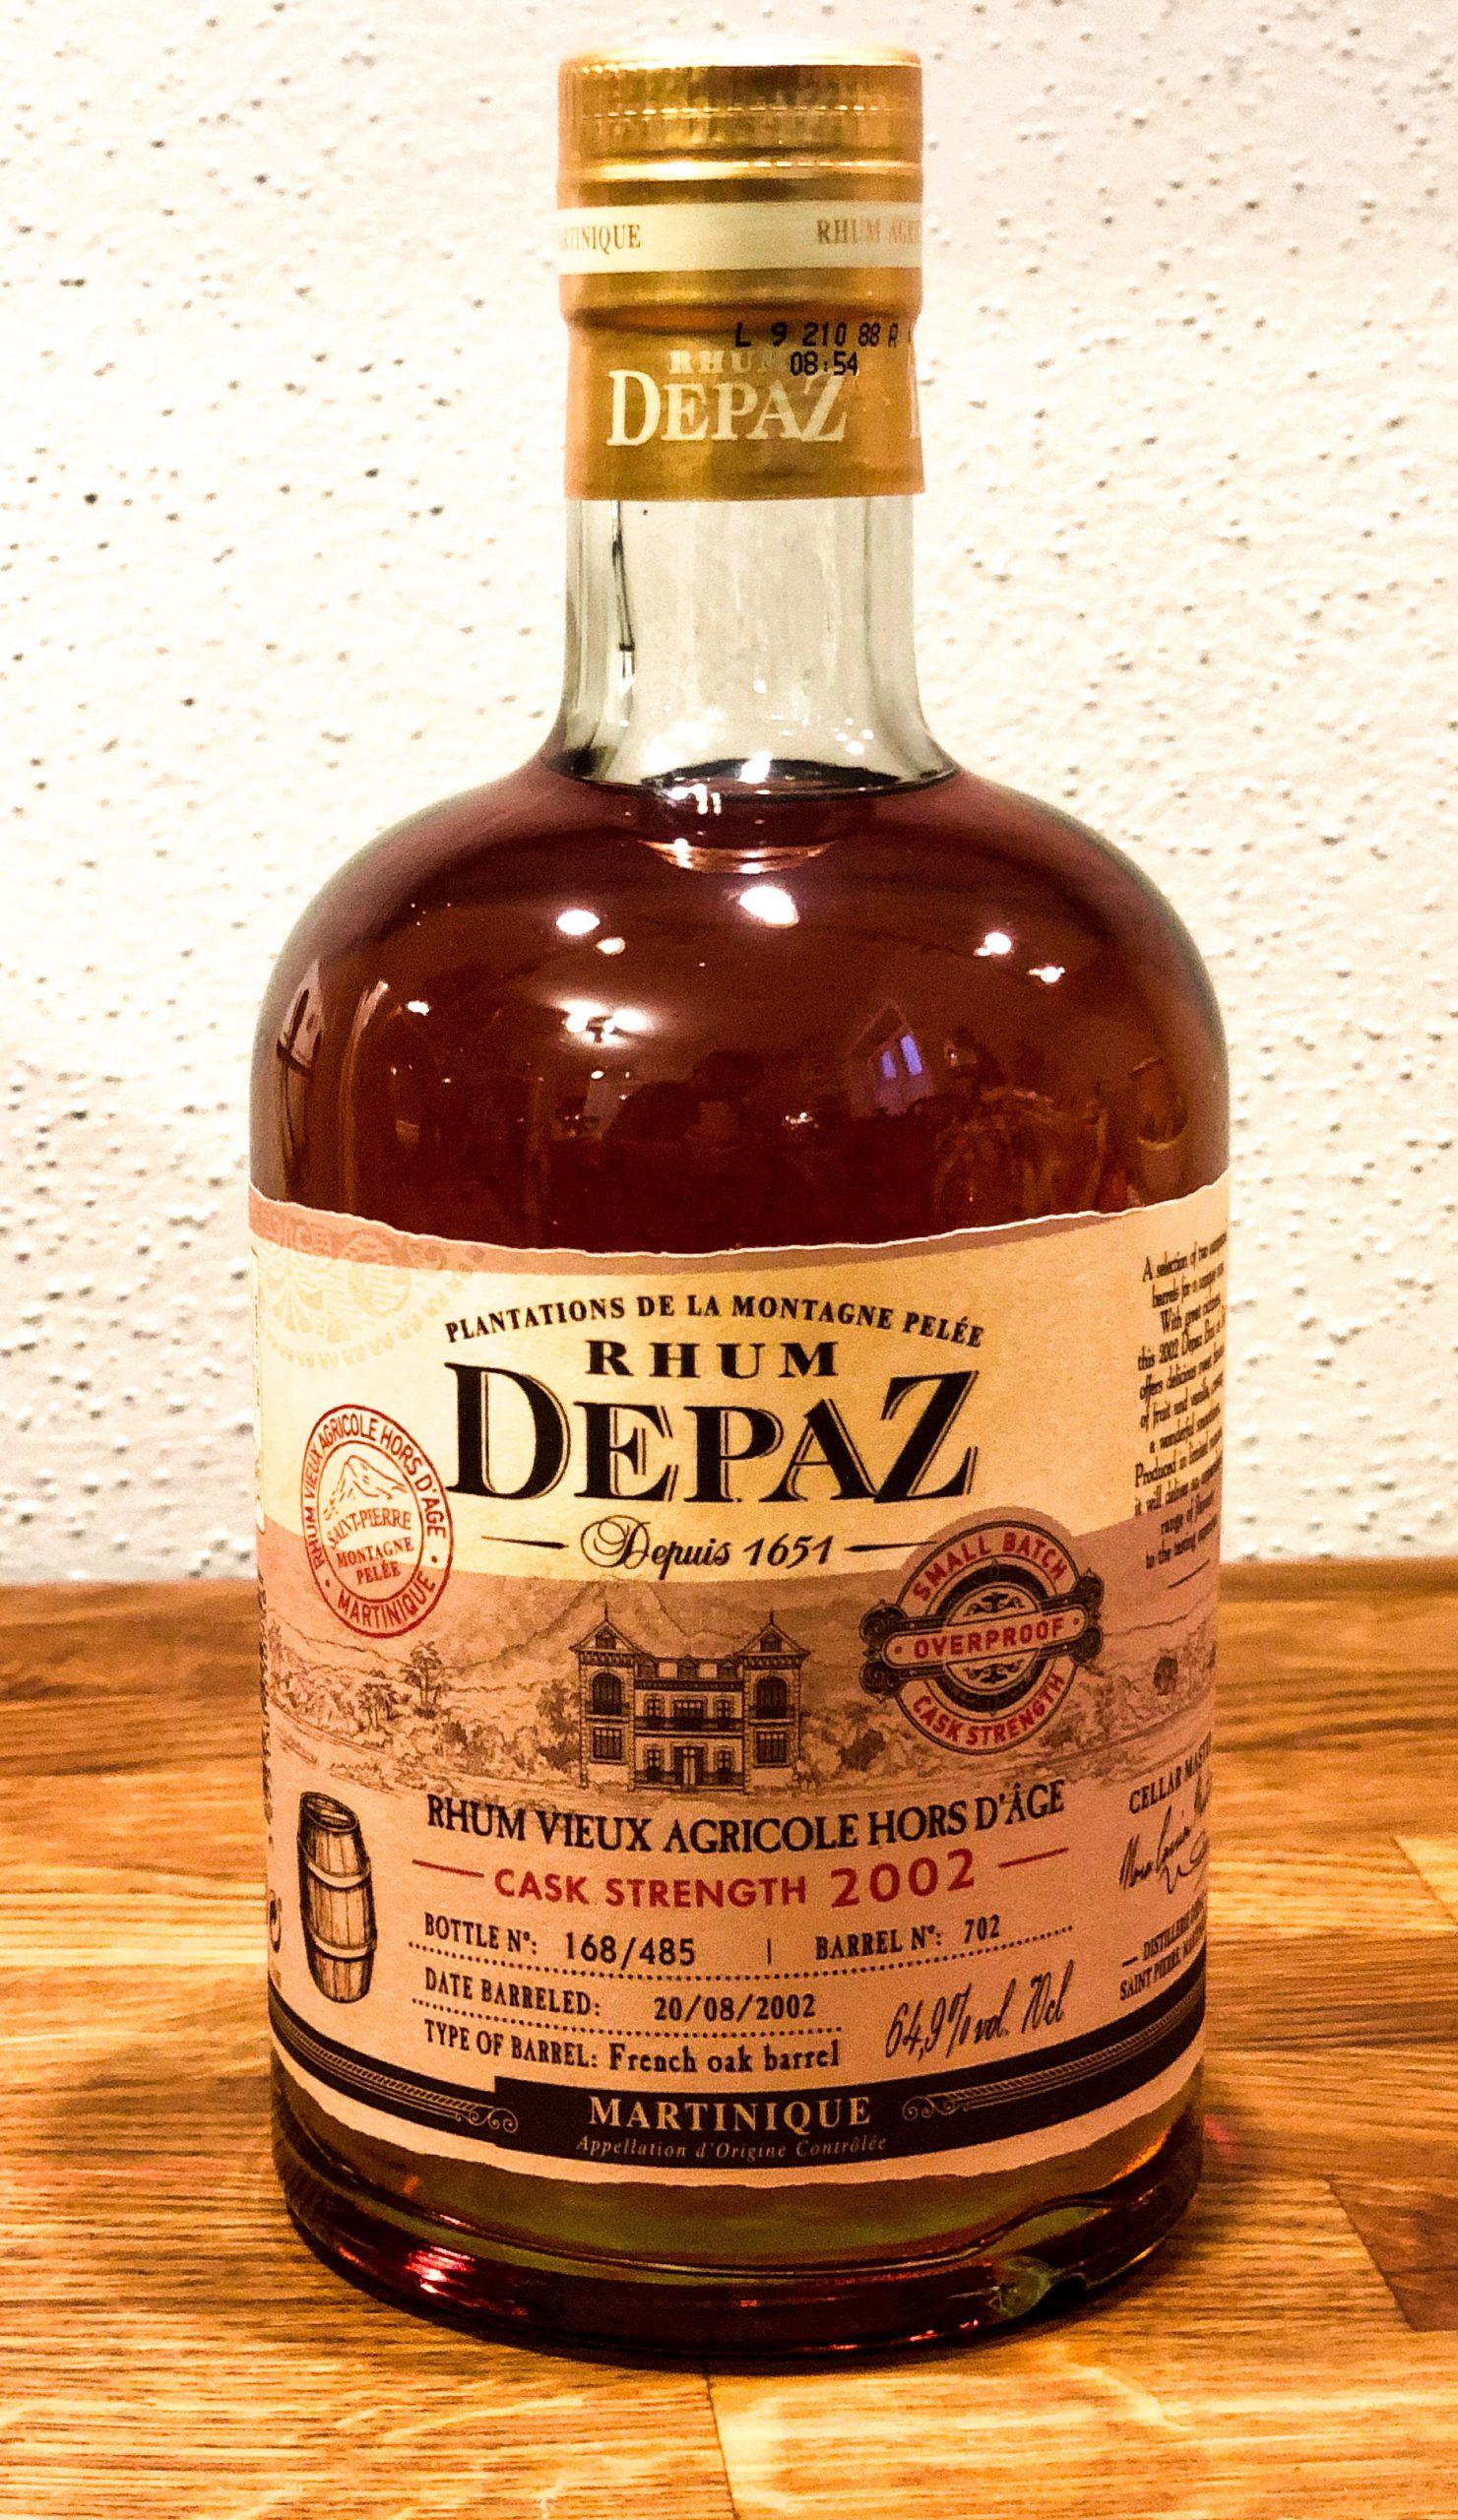 Rhum Depaz Cask Strength 2002